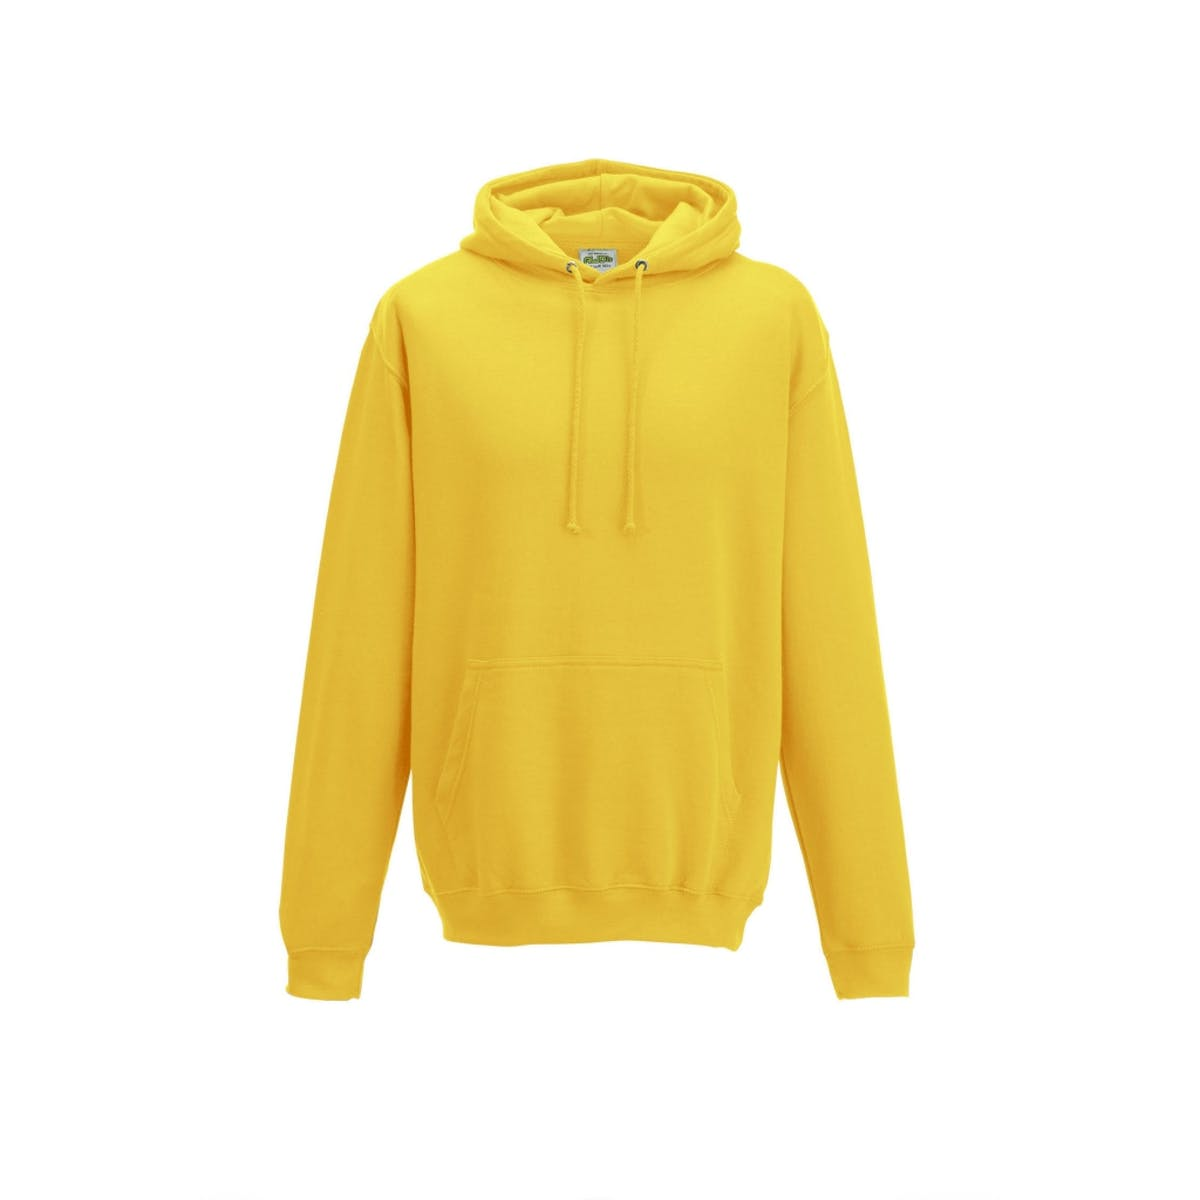 sun yellow college hoodies